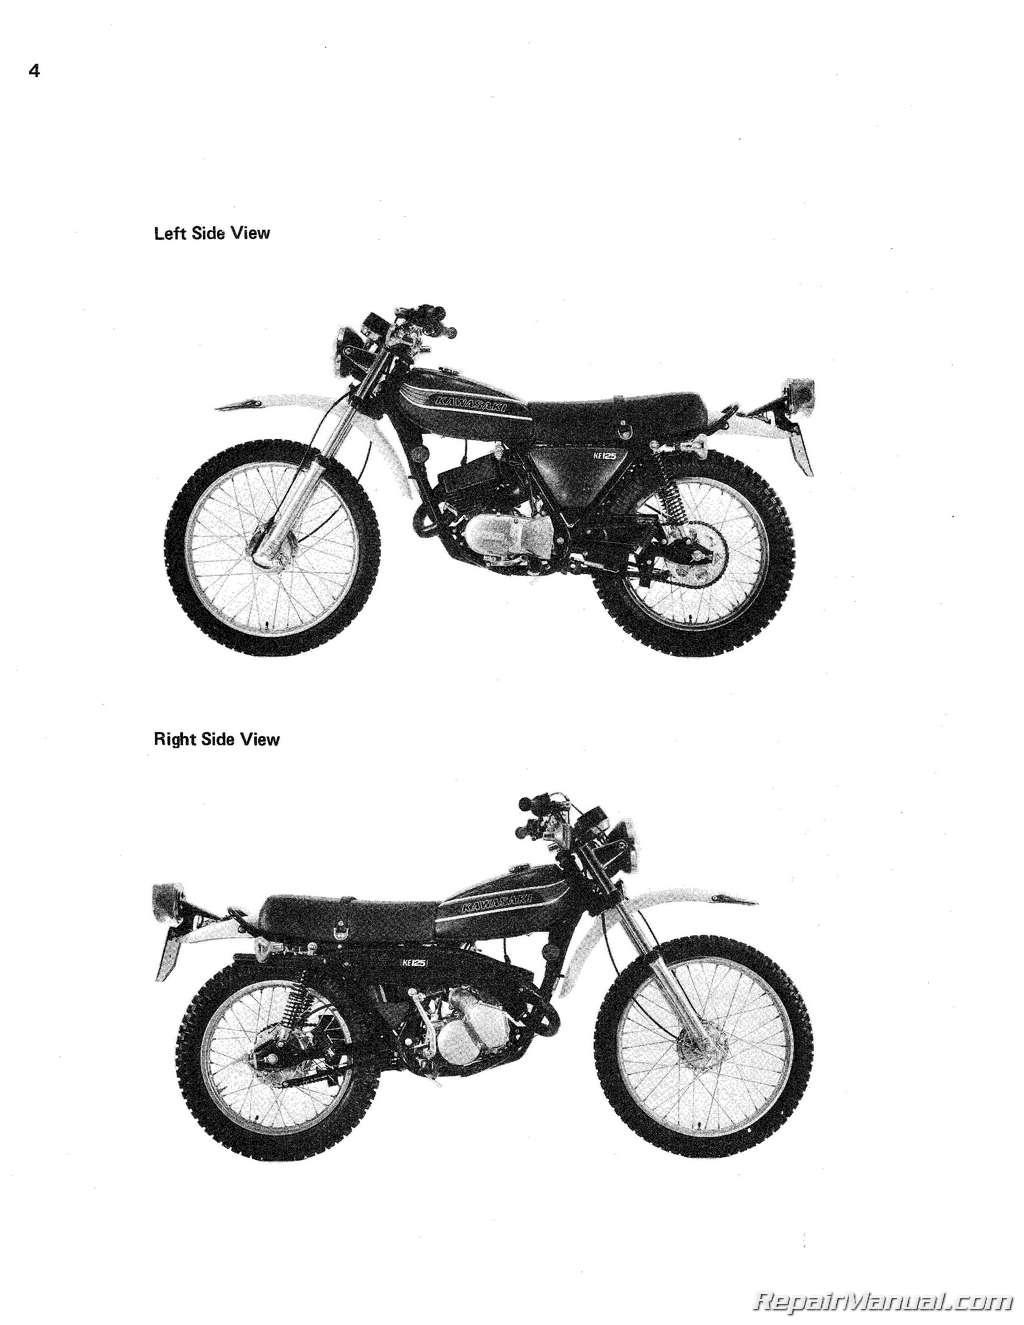 1974 Kawasaki F7 Wiring Diagrams Trusted Diagram Ks125 Schematic Motorcycle Parts